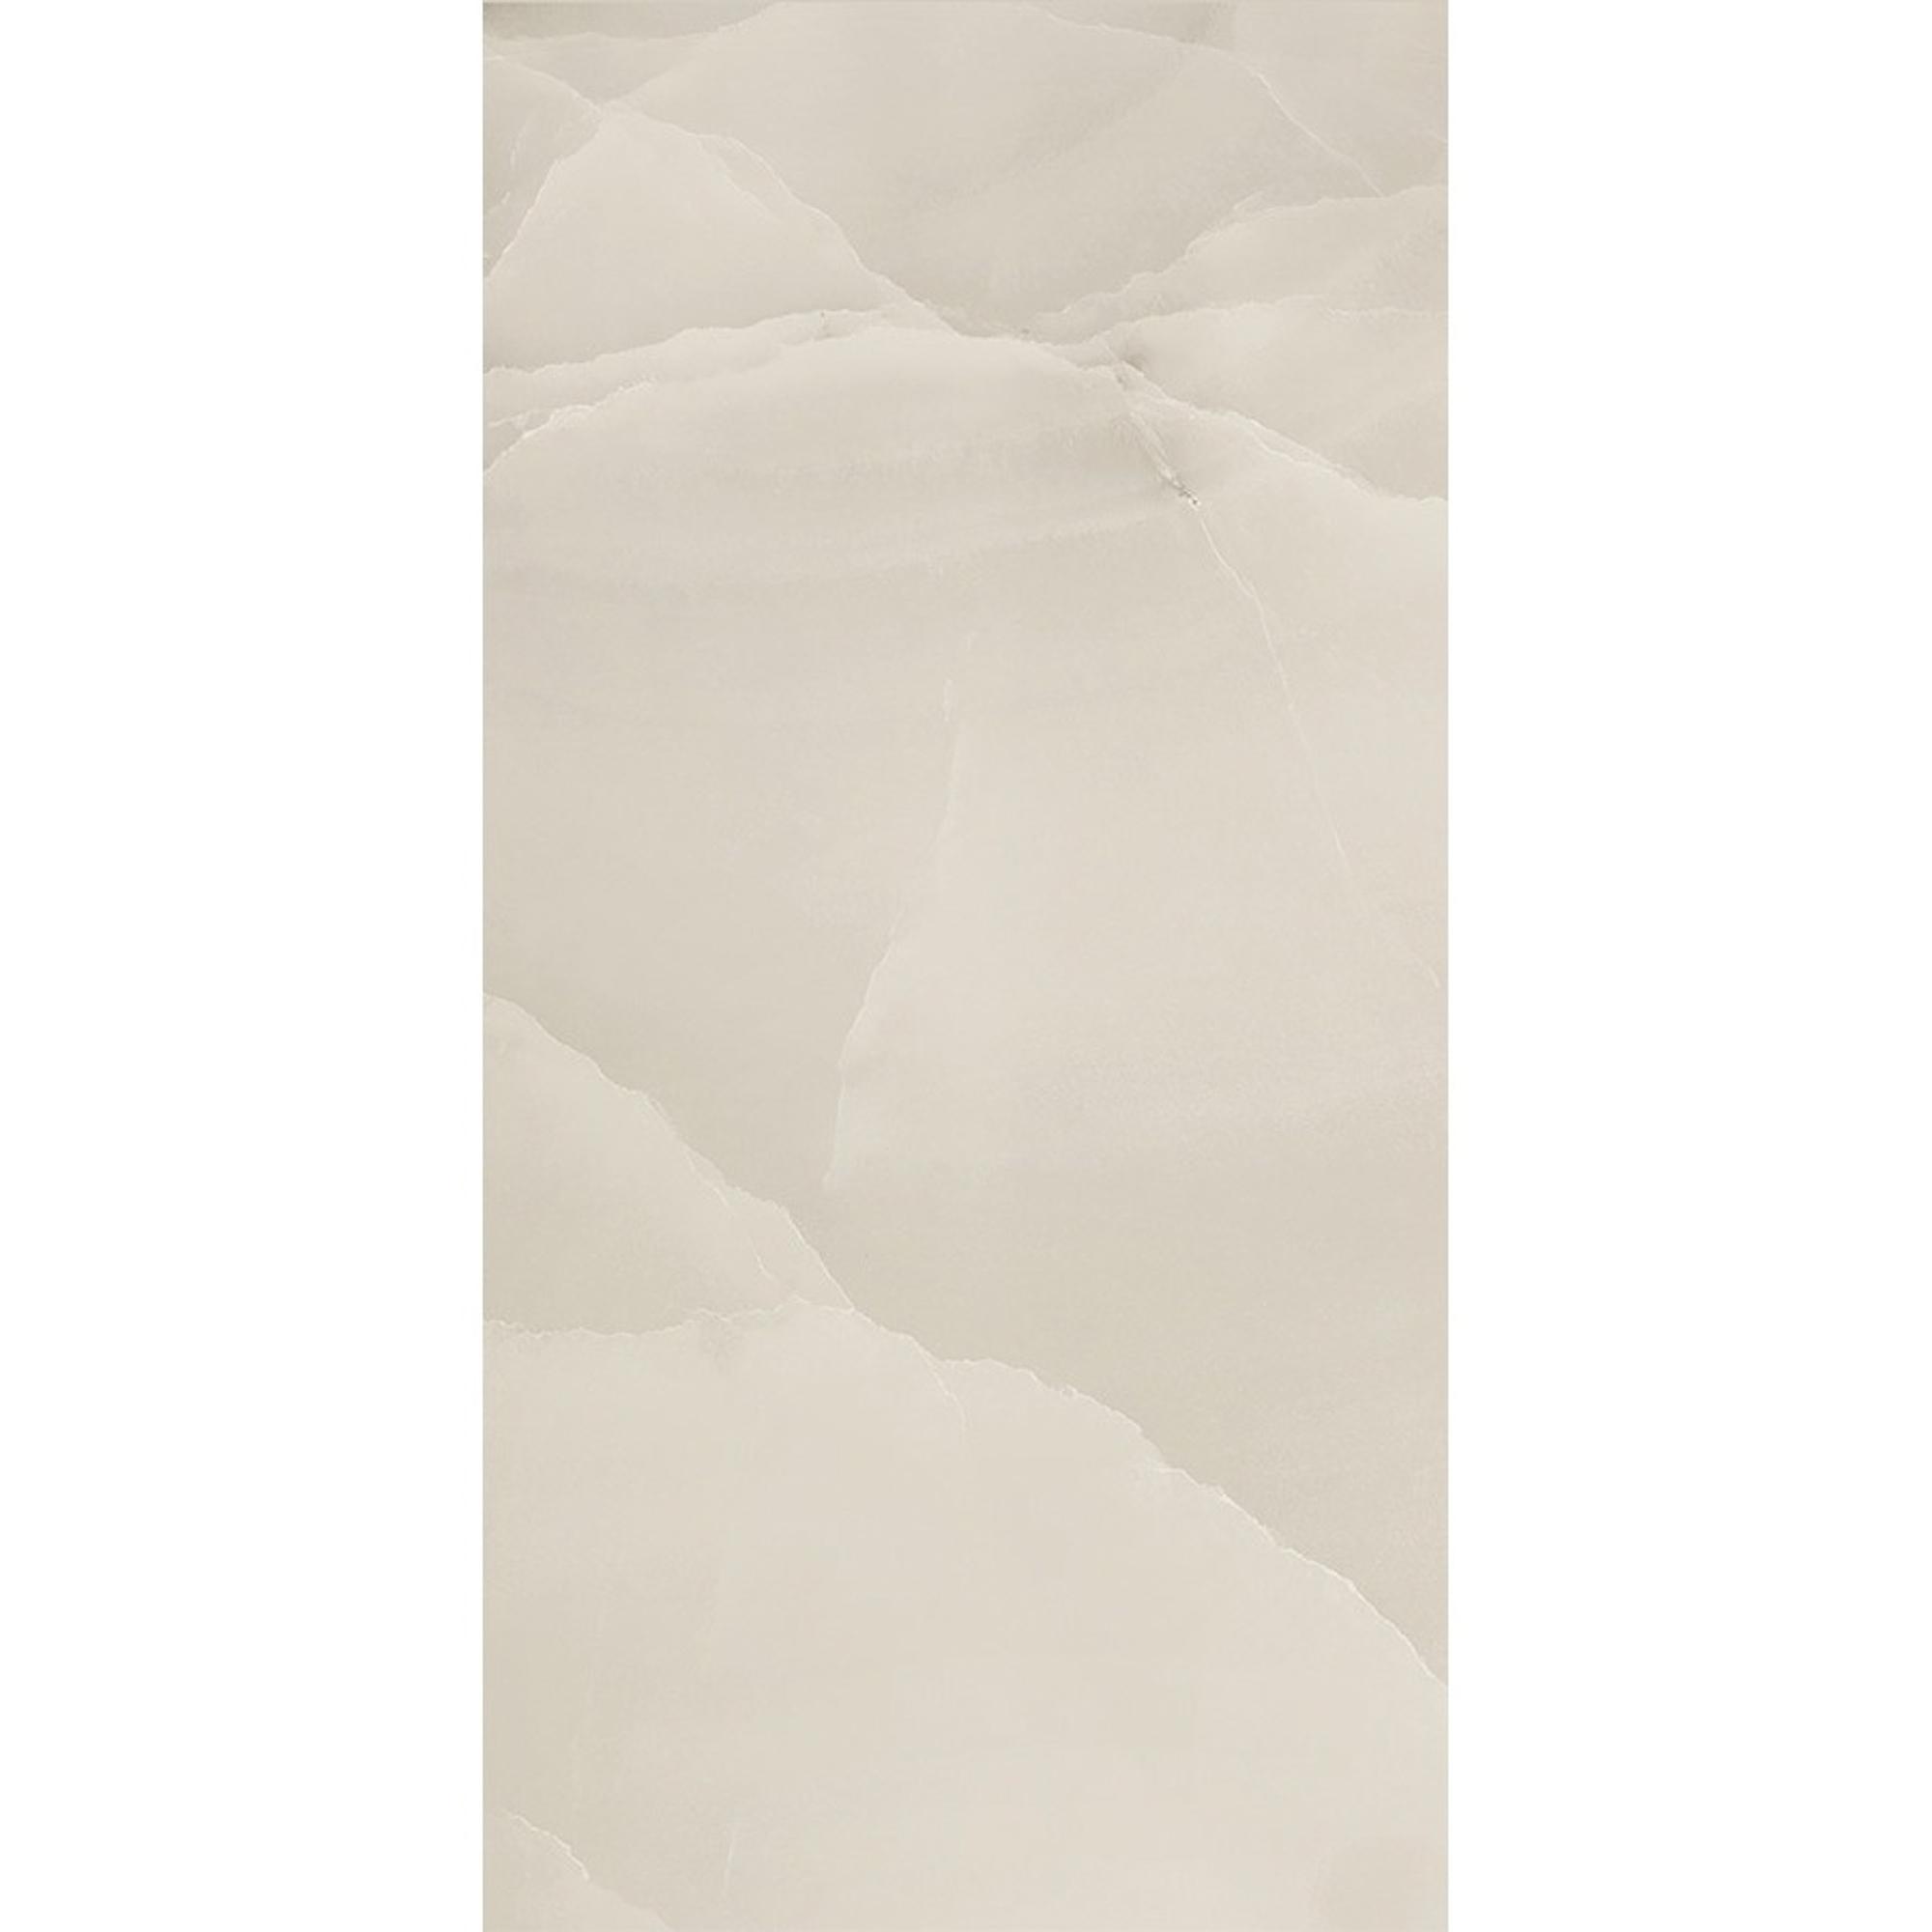 Декор Керлайф Classico Onice Gris 1 1c 31.5*63 см настенная плитка kerlife stella blu 1c 31 5x63